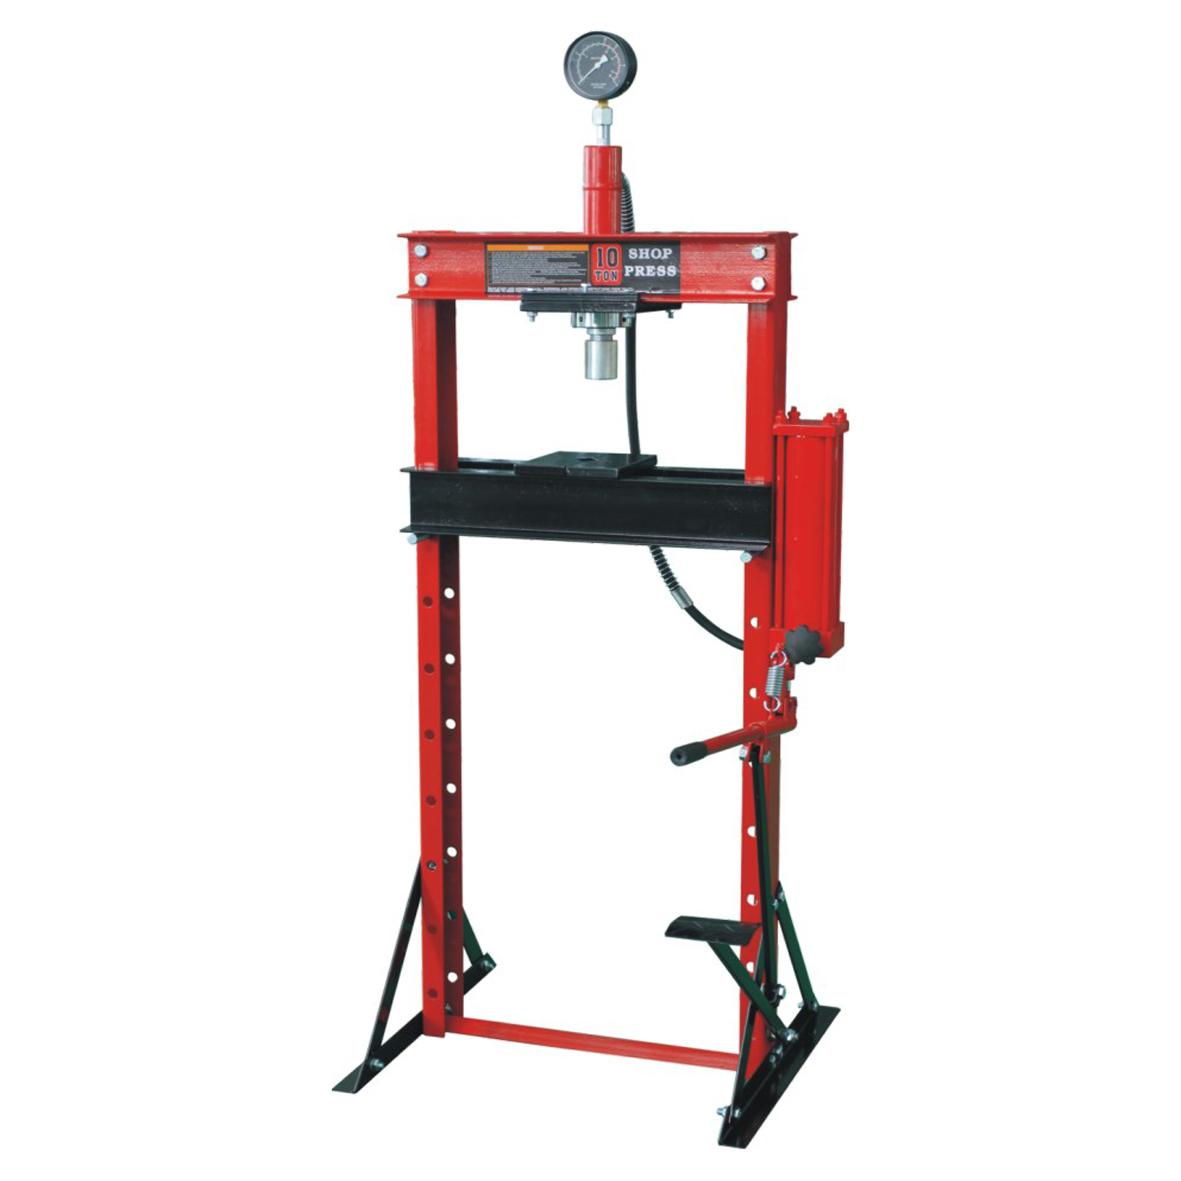 0901E-2 Wholesale Hydraulic /Pneumatic shop press 10 TON Featured Image